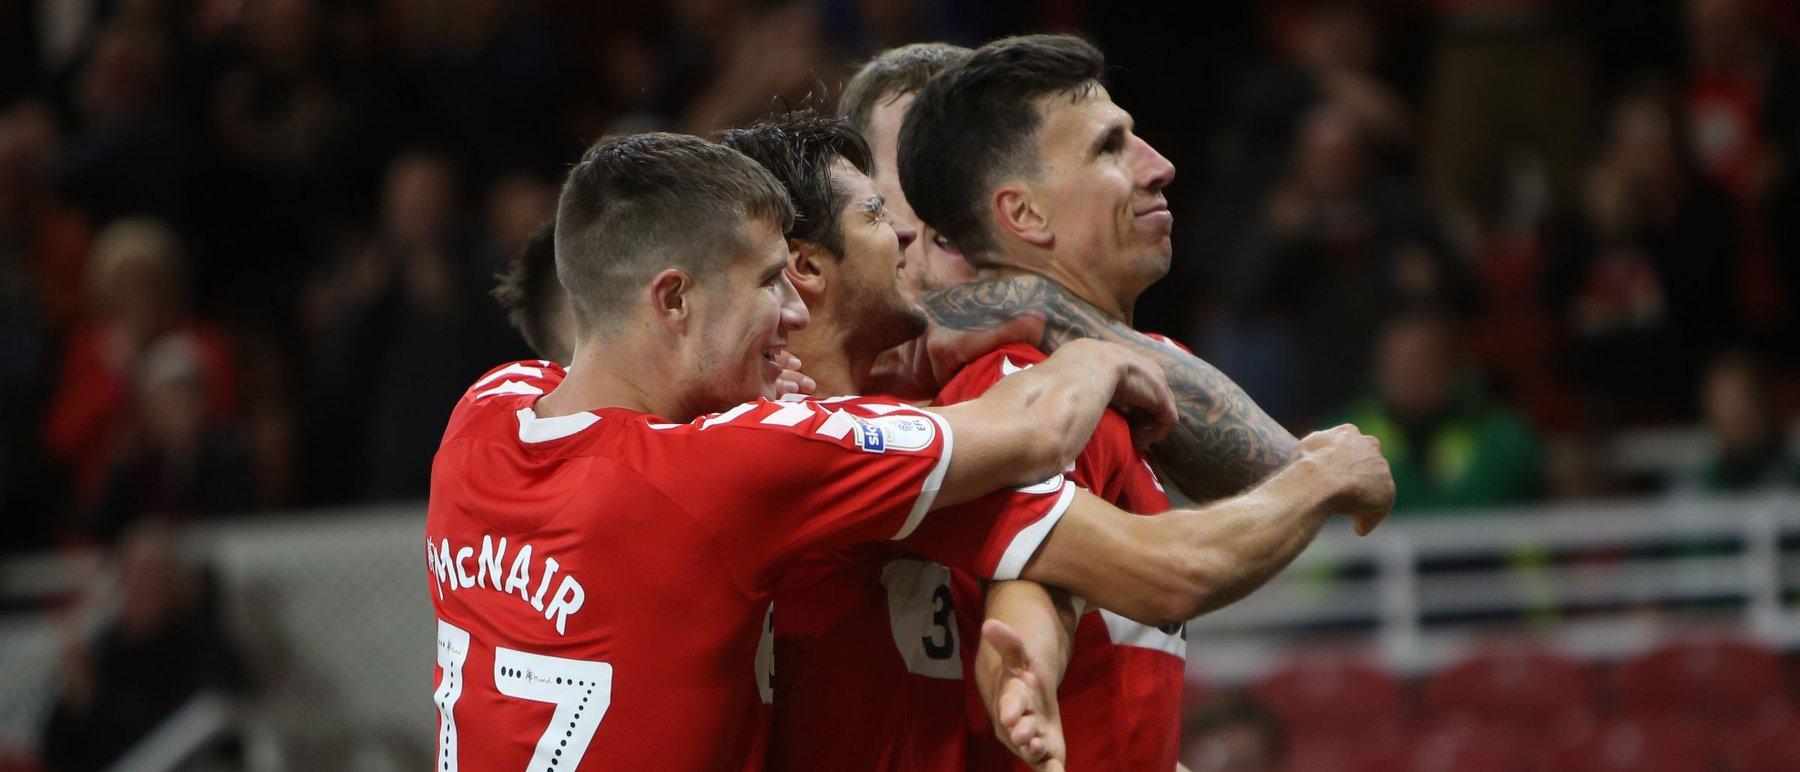 Middlesbrough-Huddersfield pronostico 26 dicembre championship